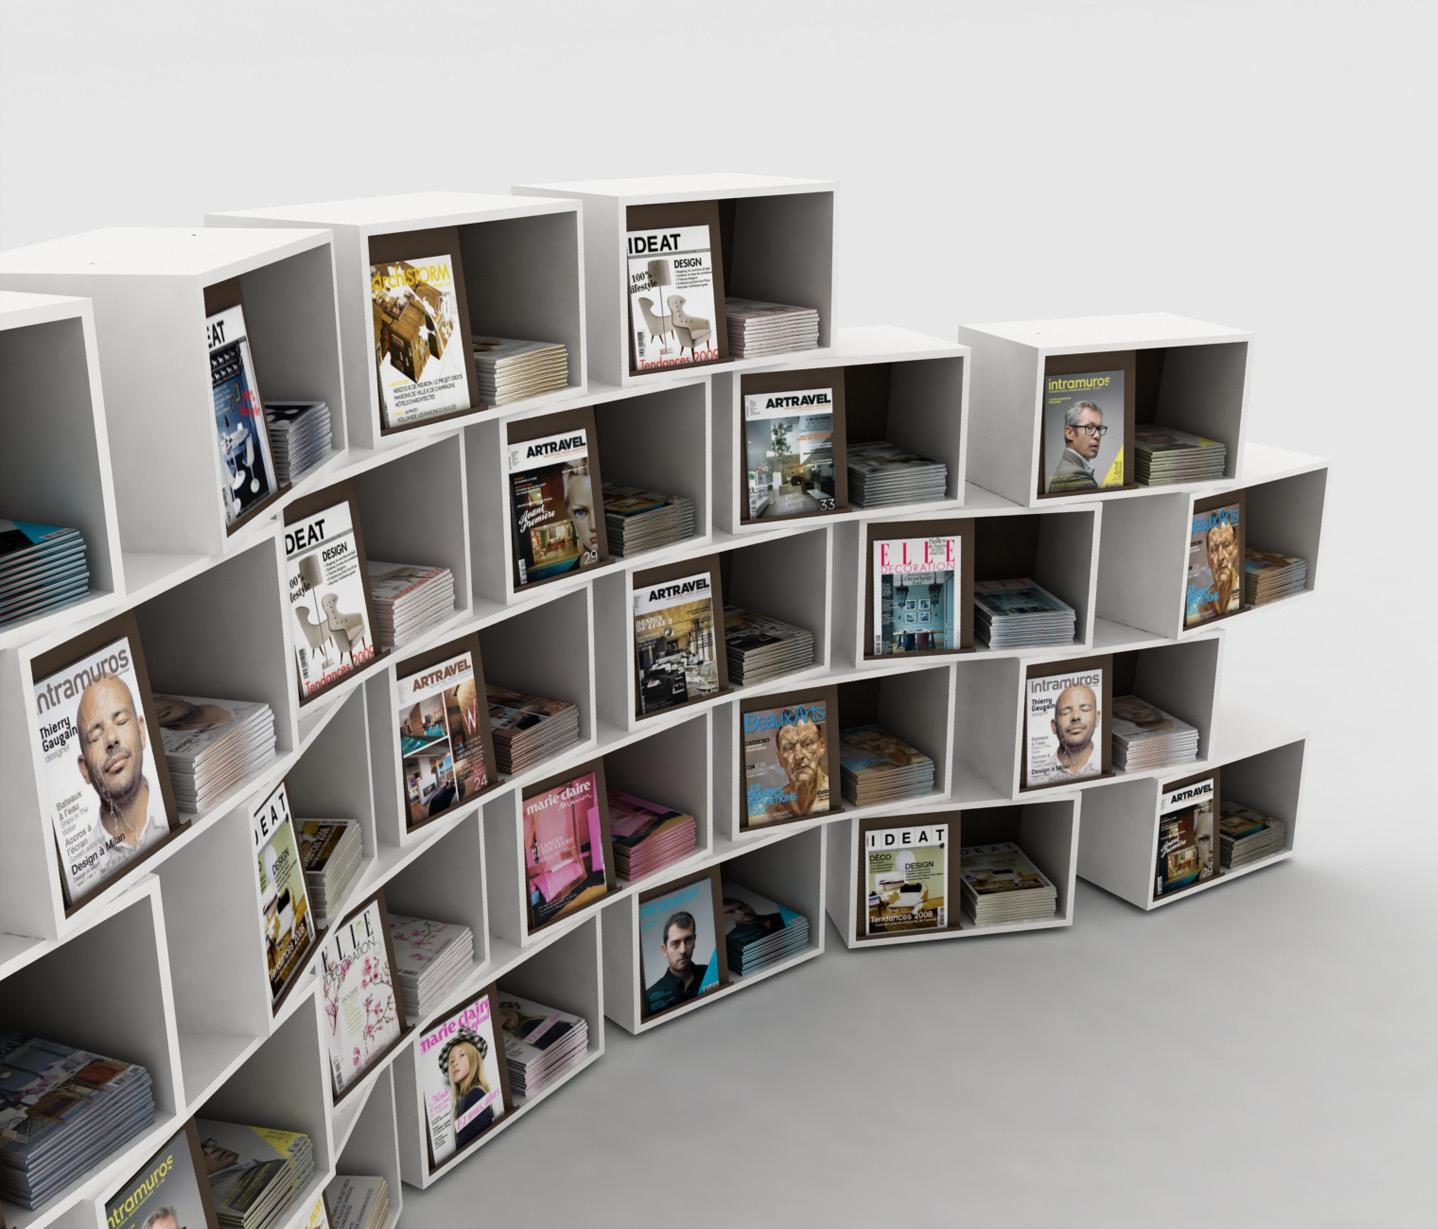 wallbox  magazine displays  holder from idm coupechoux  architonic - wallbox by idm coupechoux · wallbox by idm coupechoux